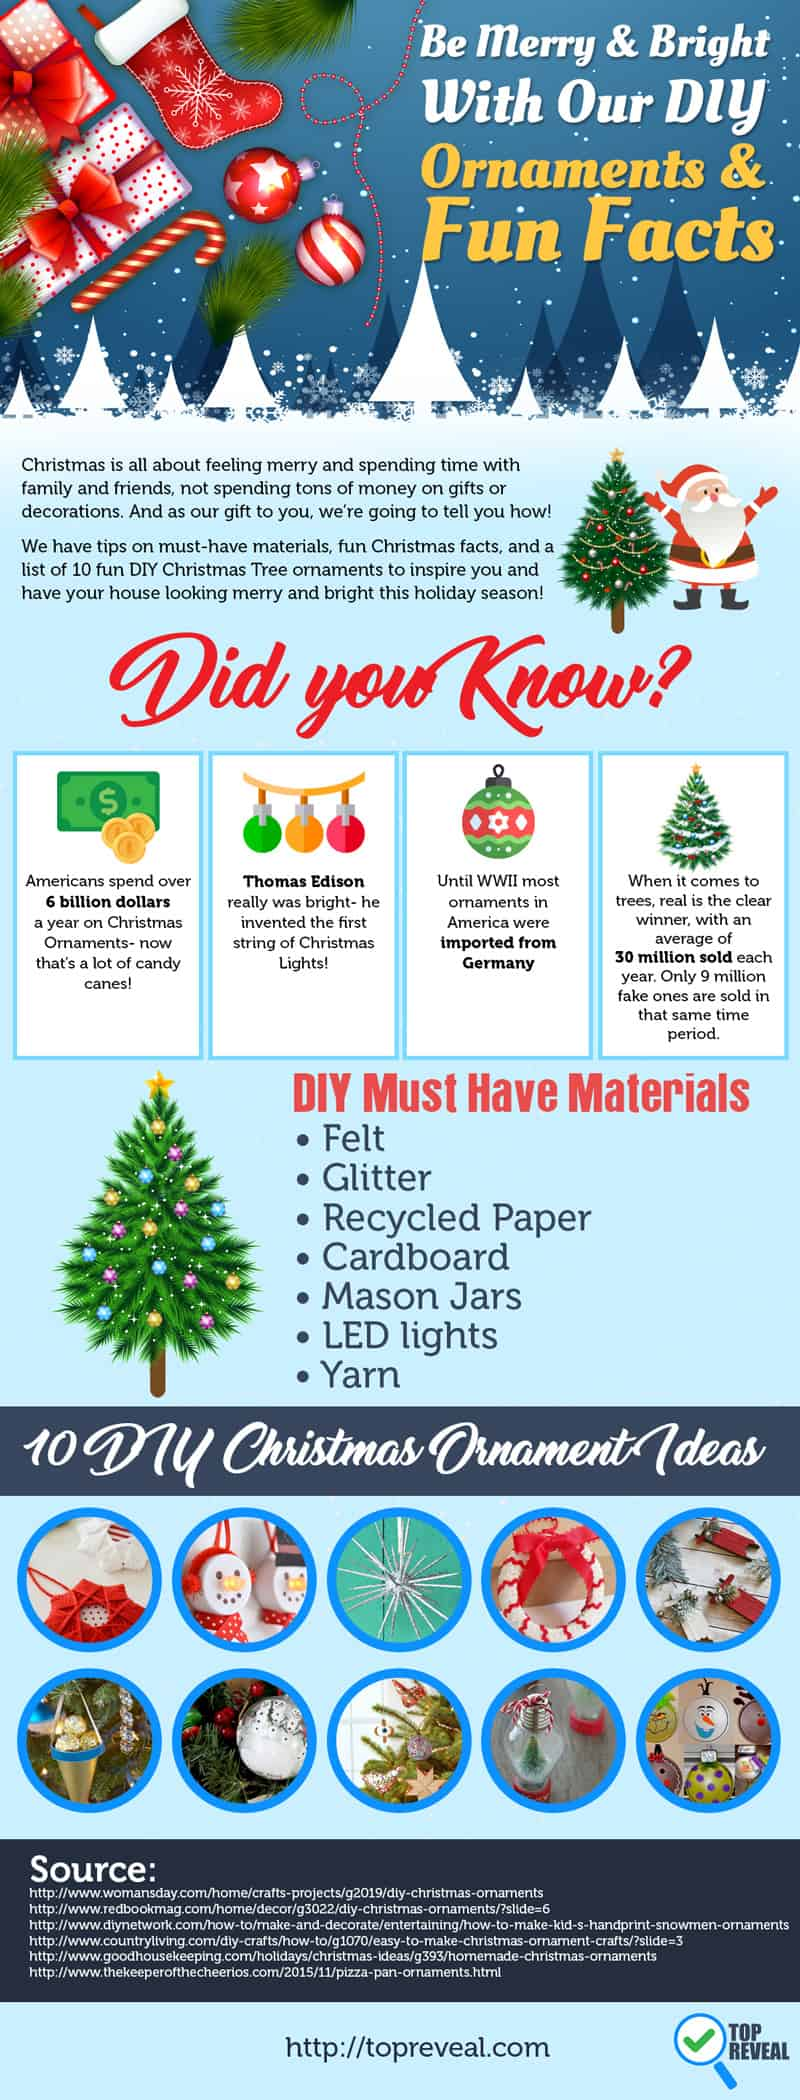 Homemade Christmas Ornaments DIY Infographic